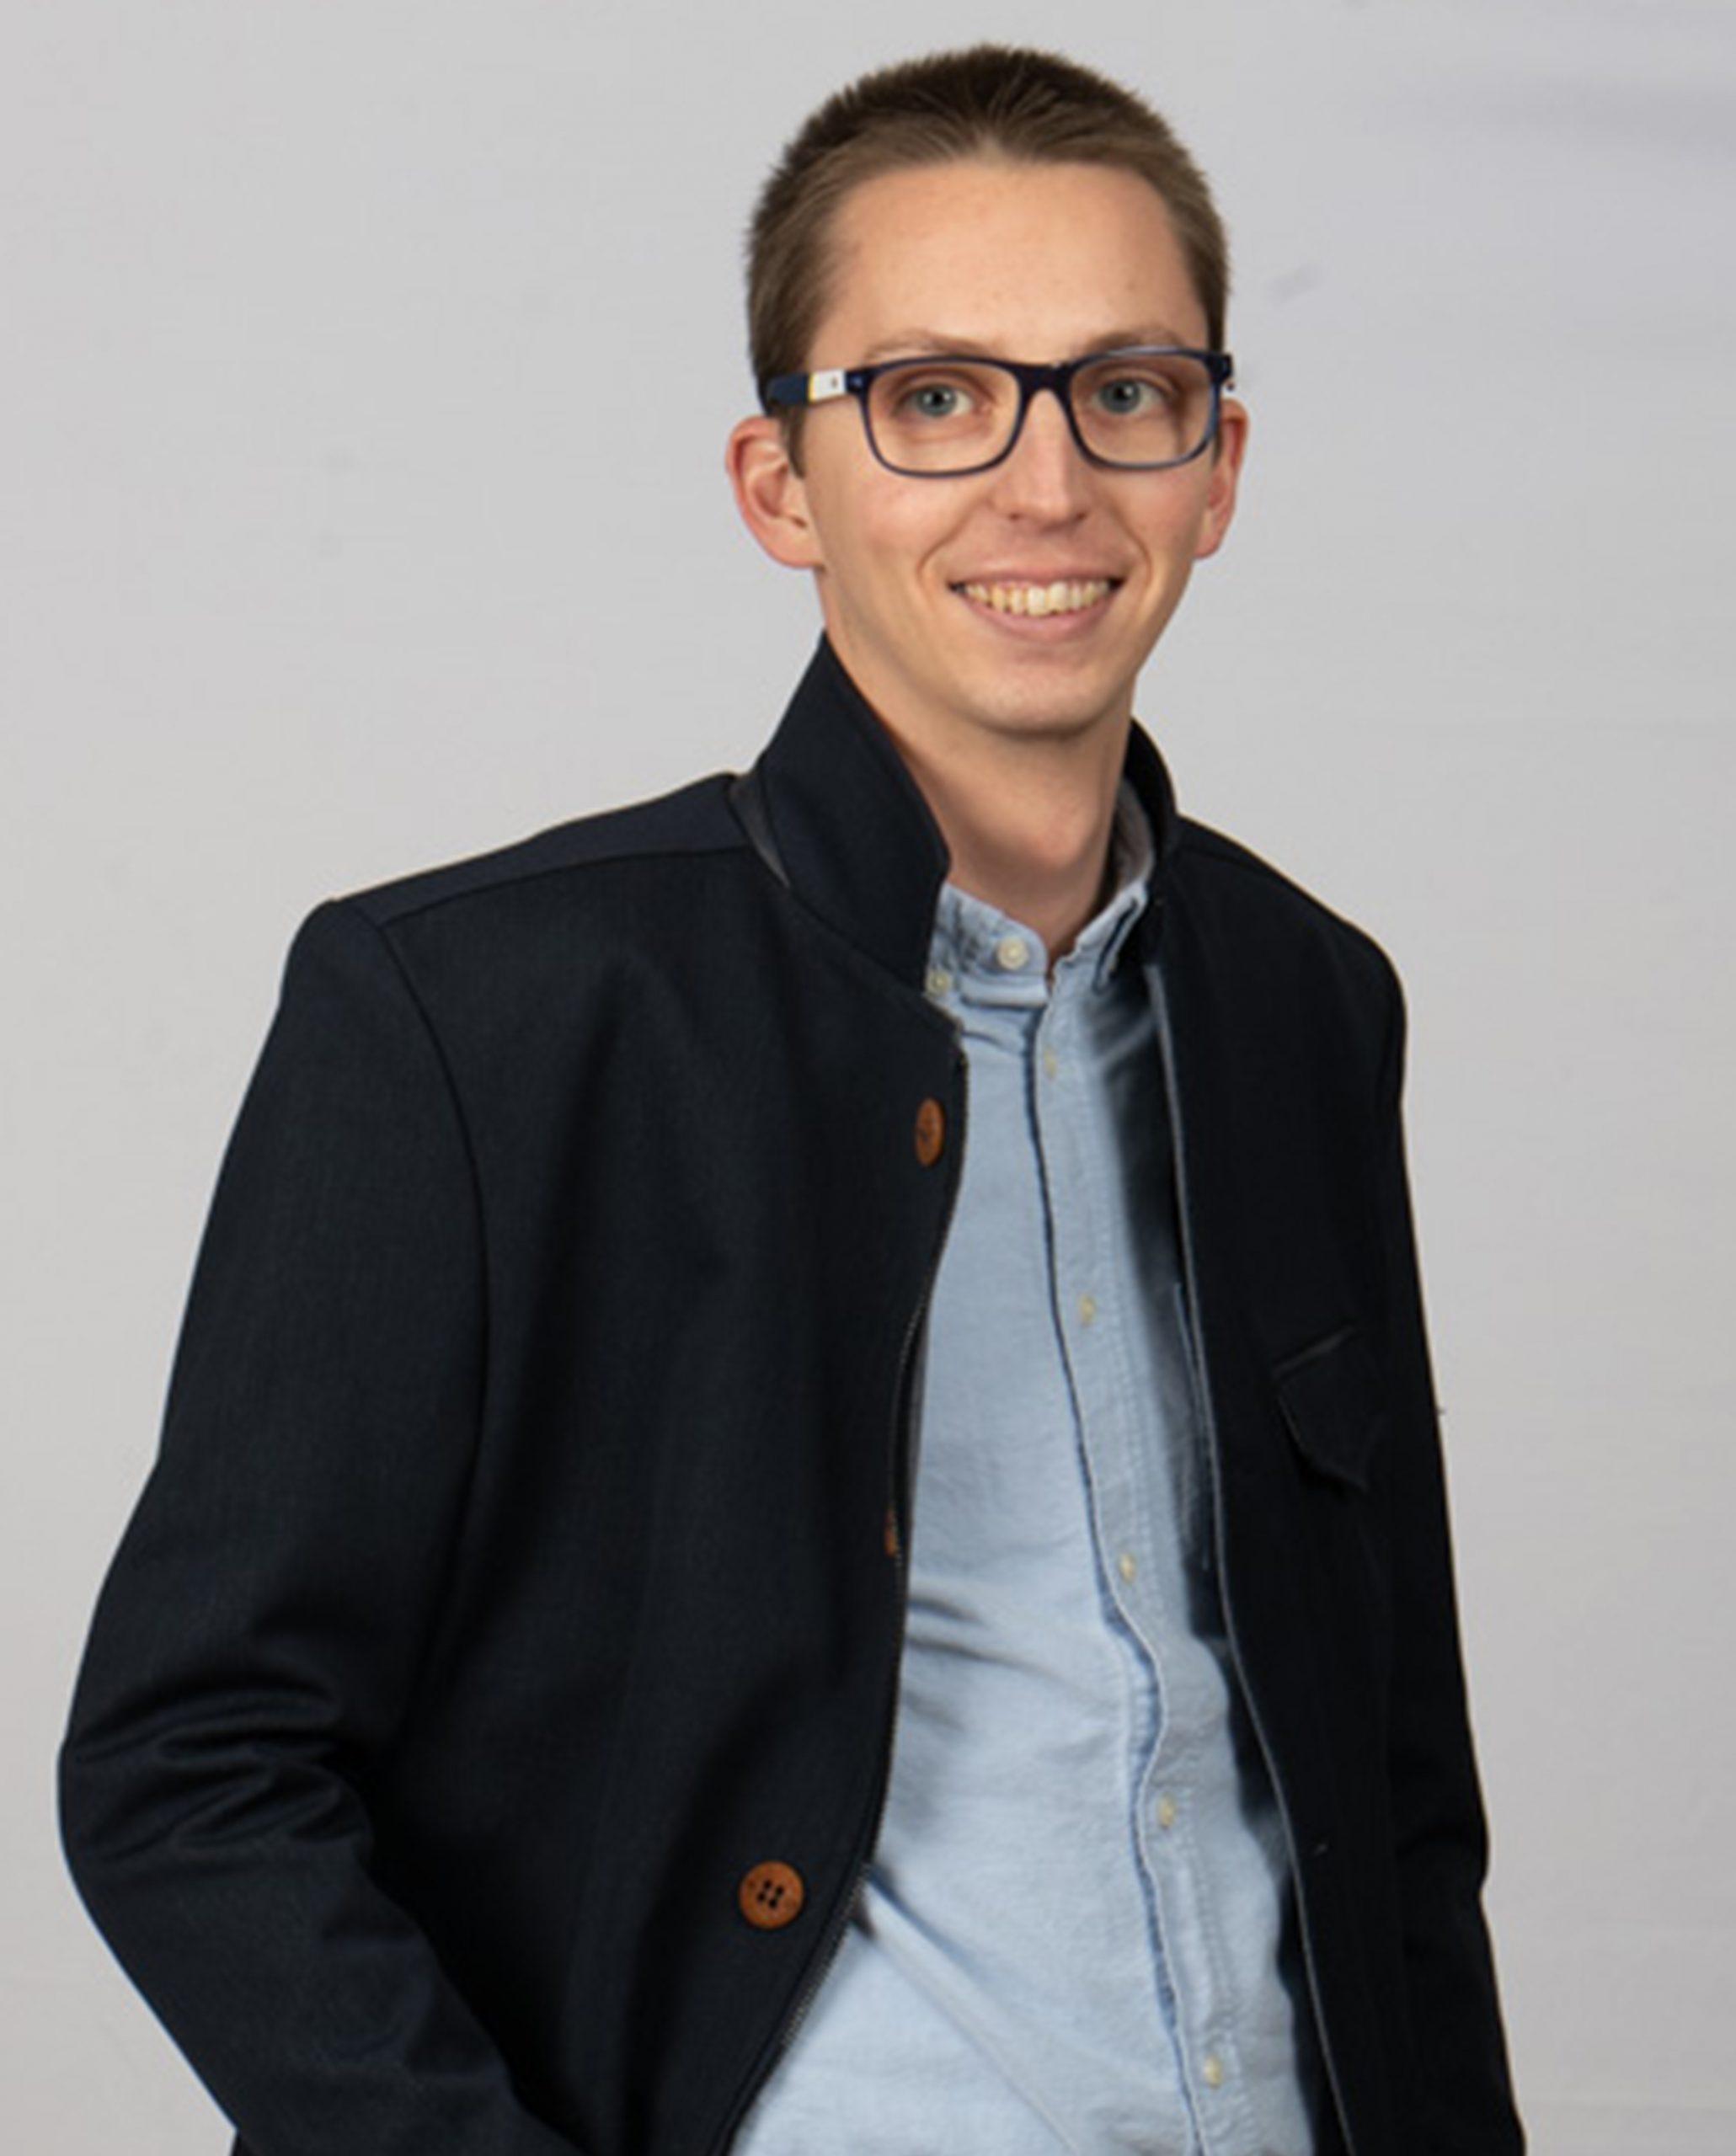 Manuel Schiffrer